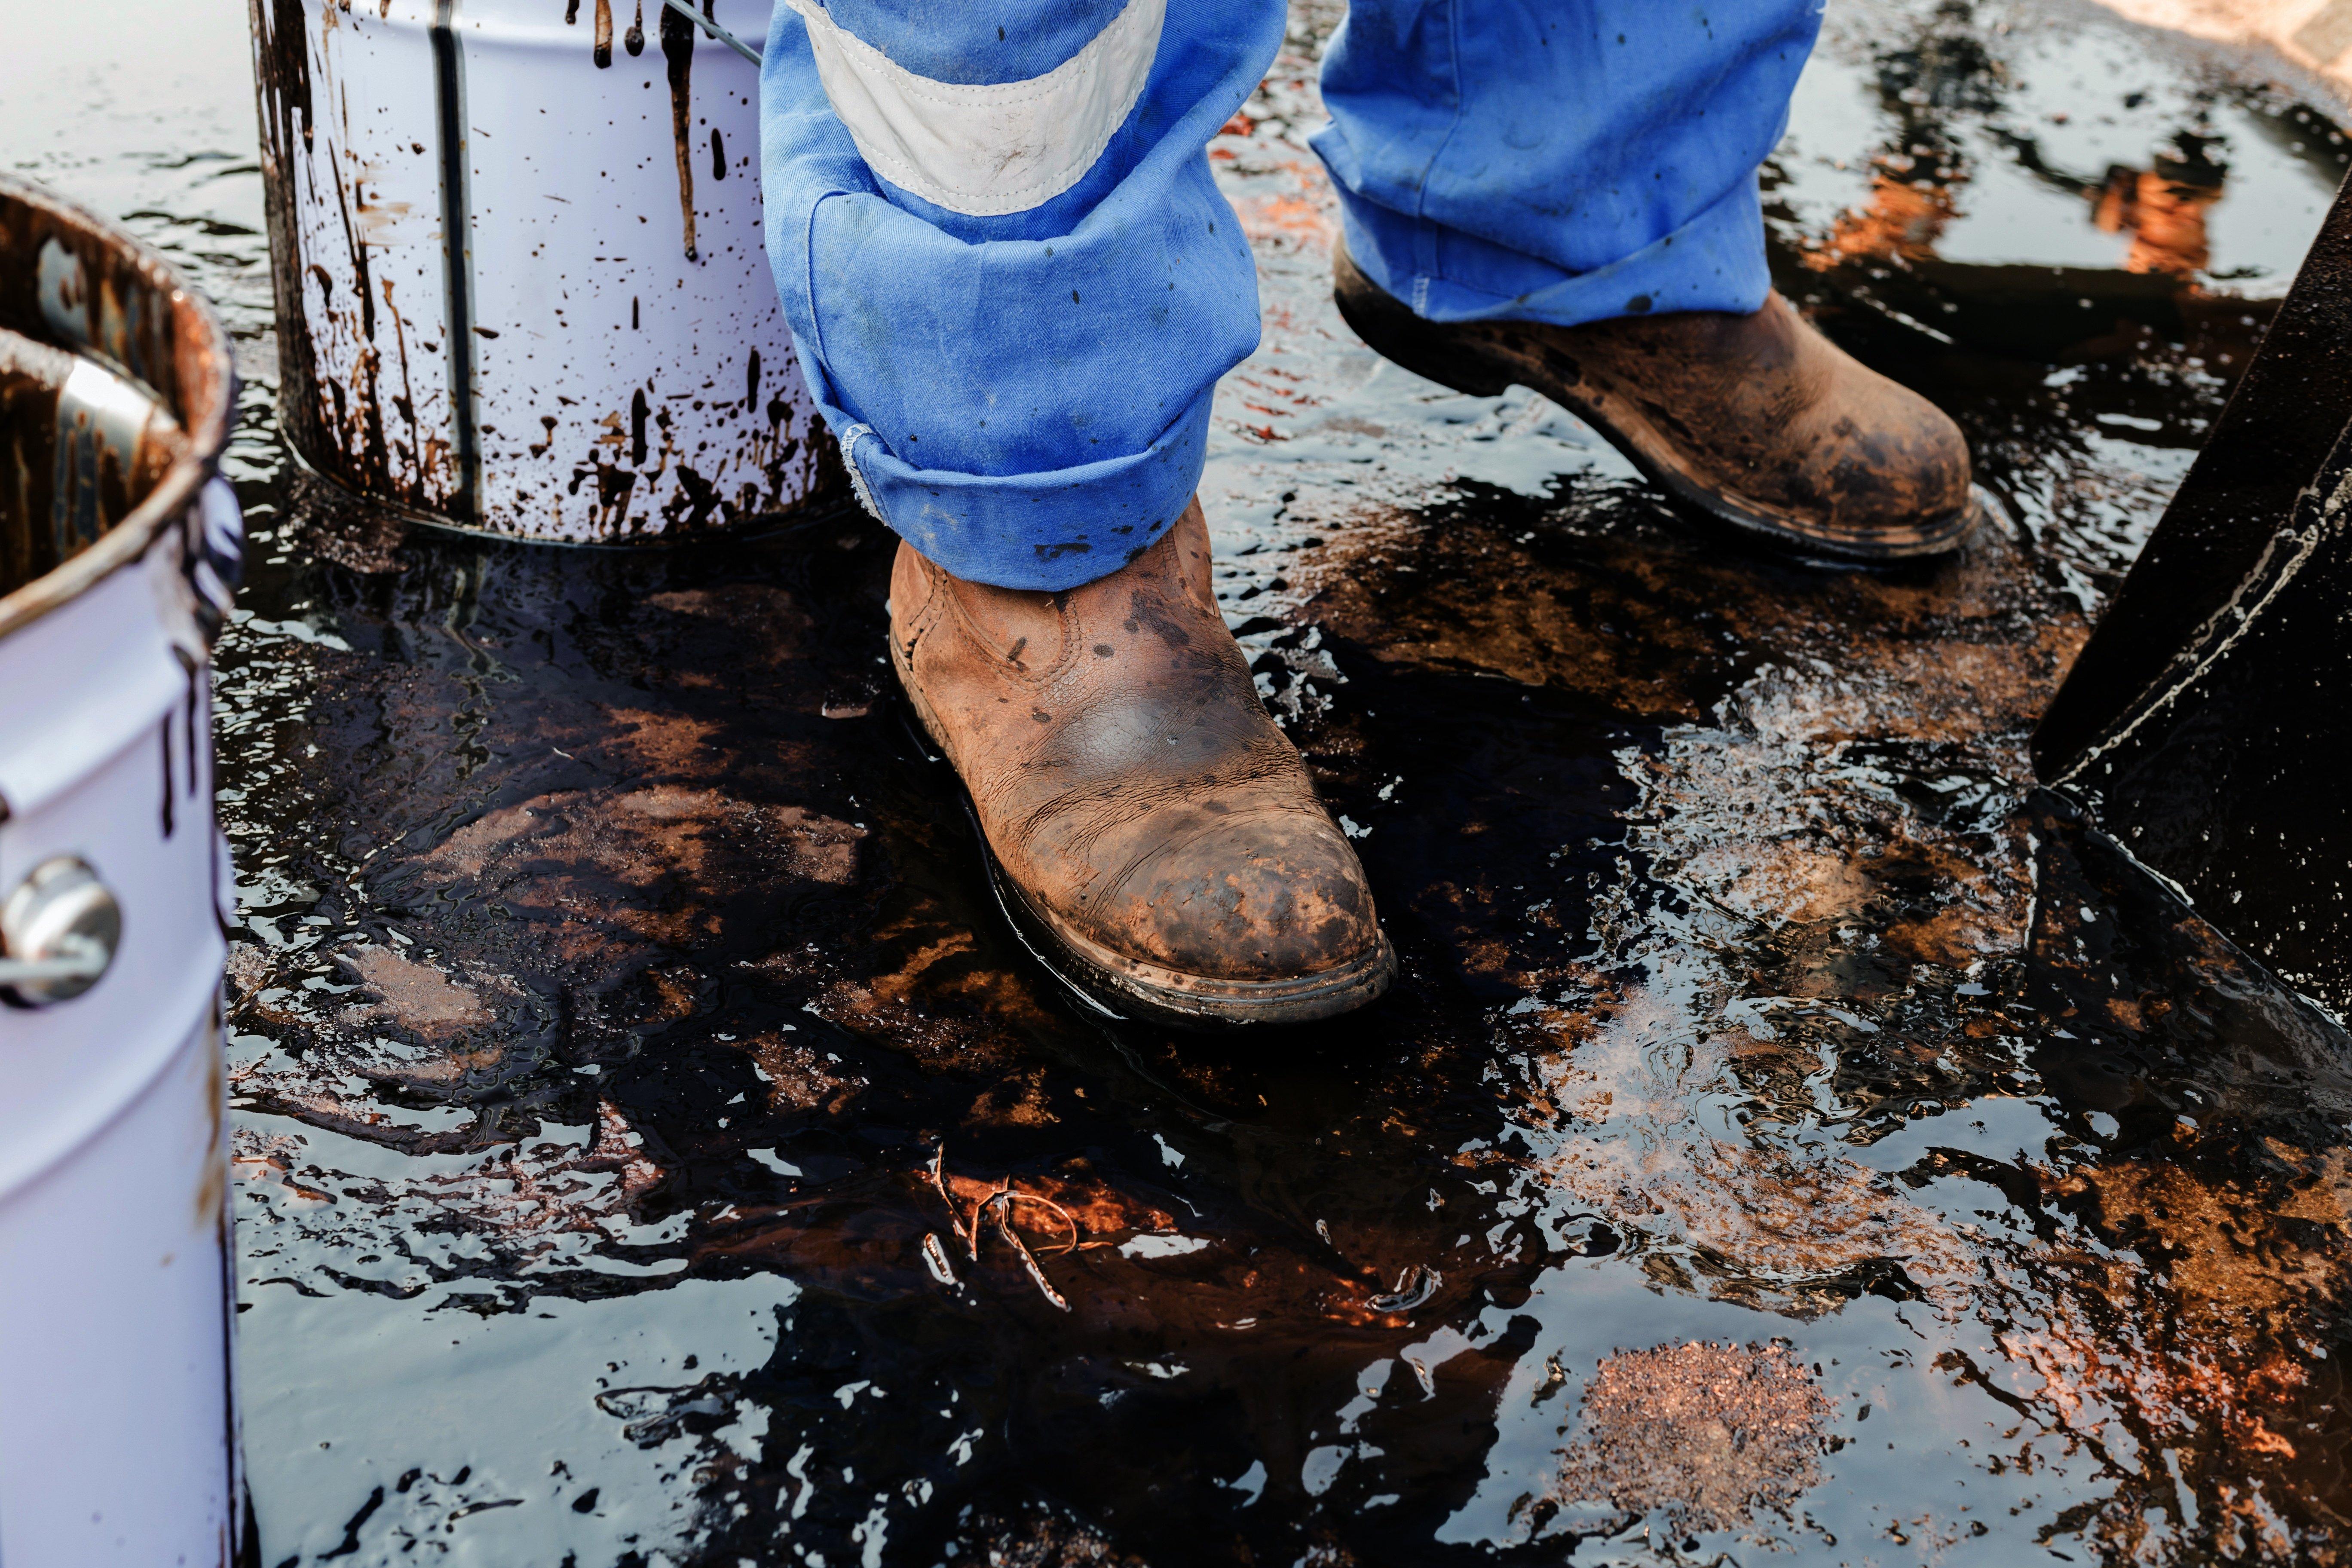 oil-spill-cleanup.jpg